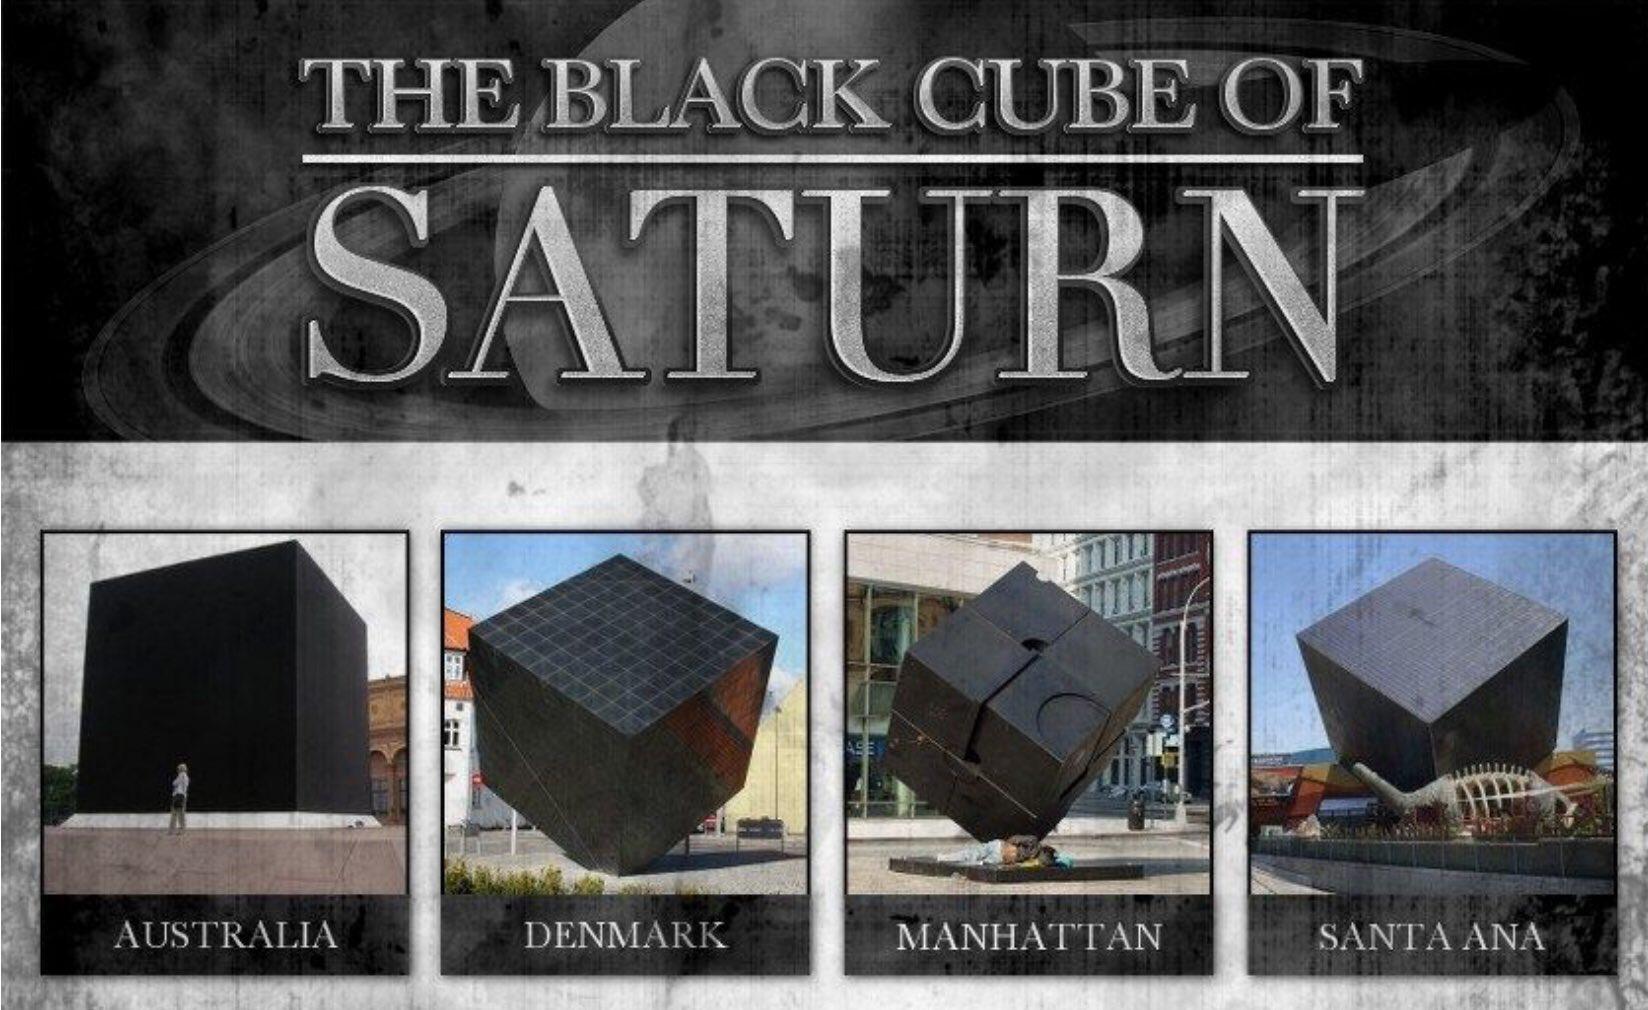 QPlusNews, Adrenochrome, Blackwaves, Black Ray Energy, Black Cube Of Saturn